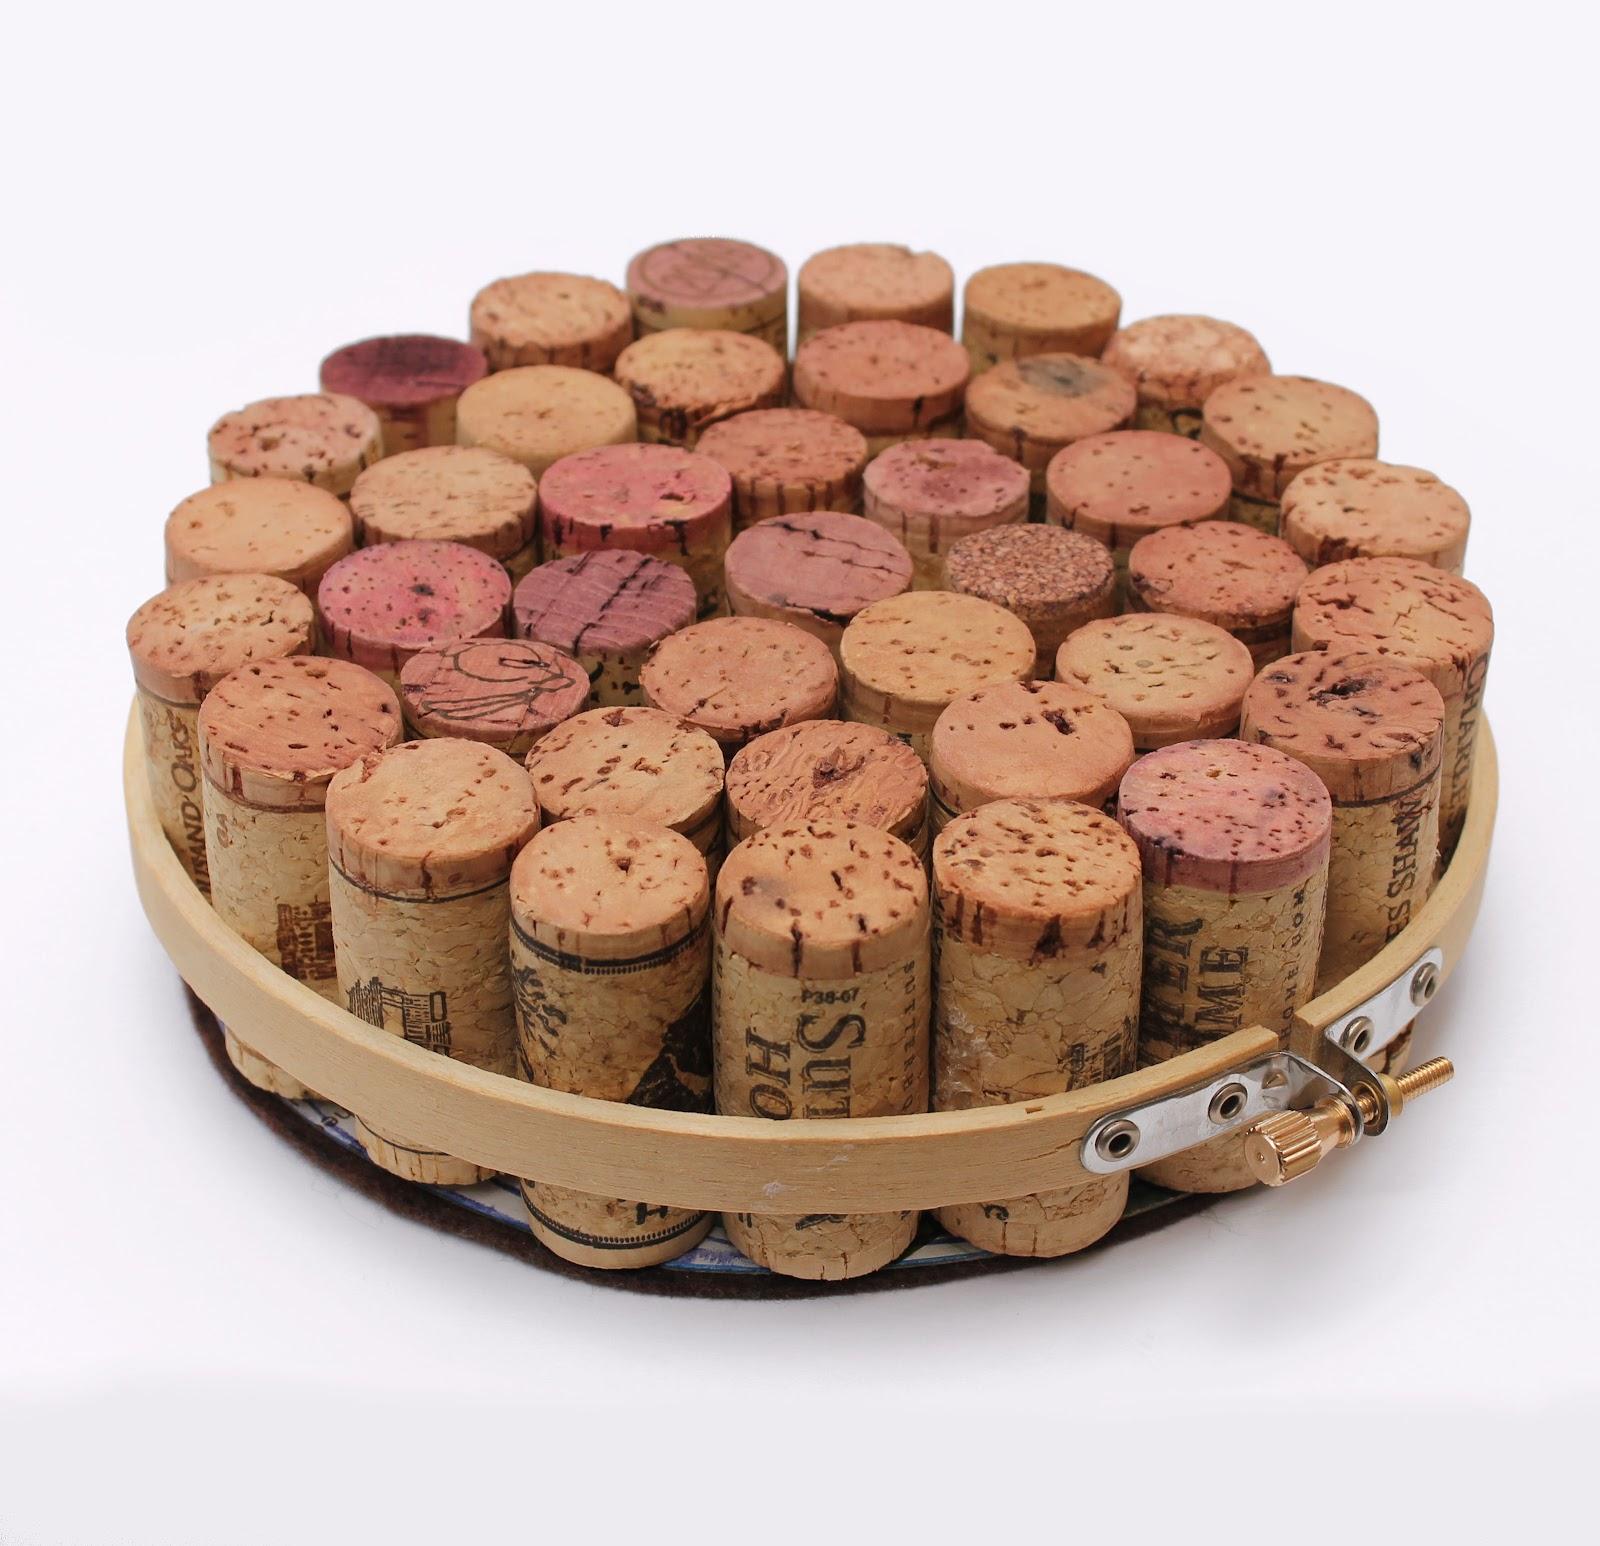 Wine Cork and Embroidery Hoop Trivet